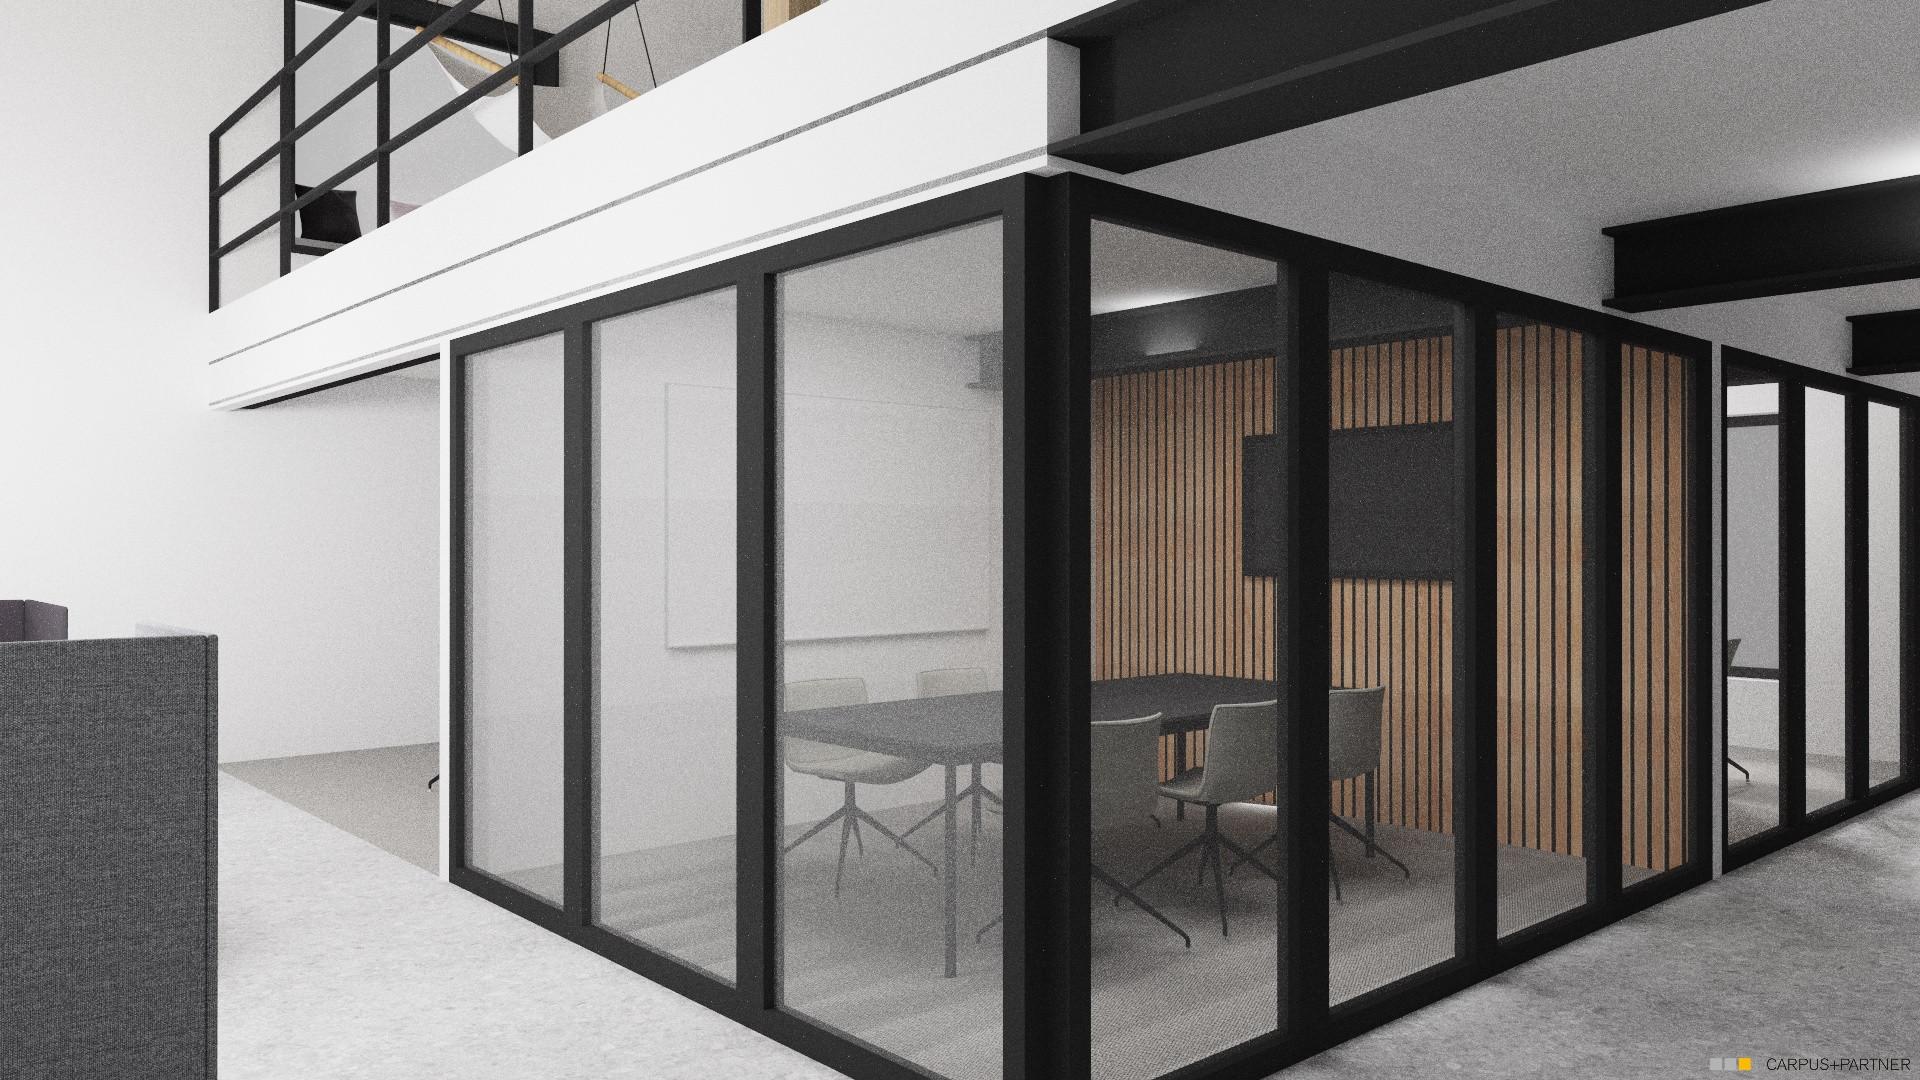 Scheune Erdgeschoss Meetingraum mit Glas